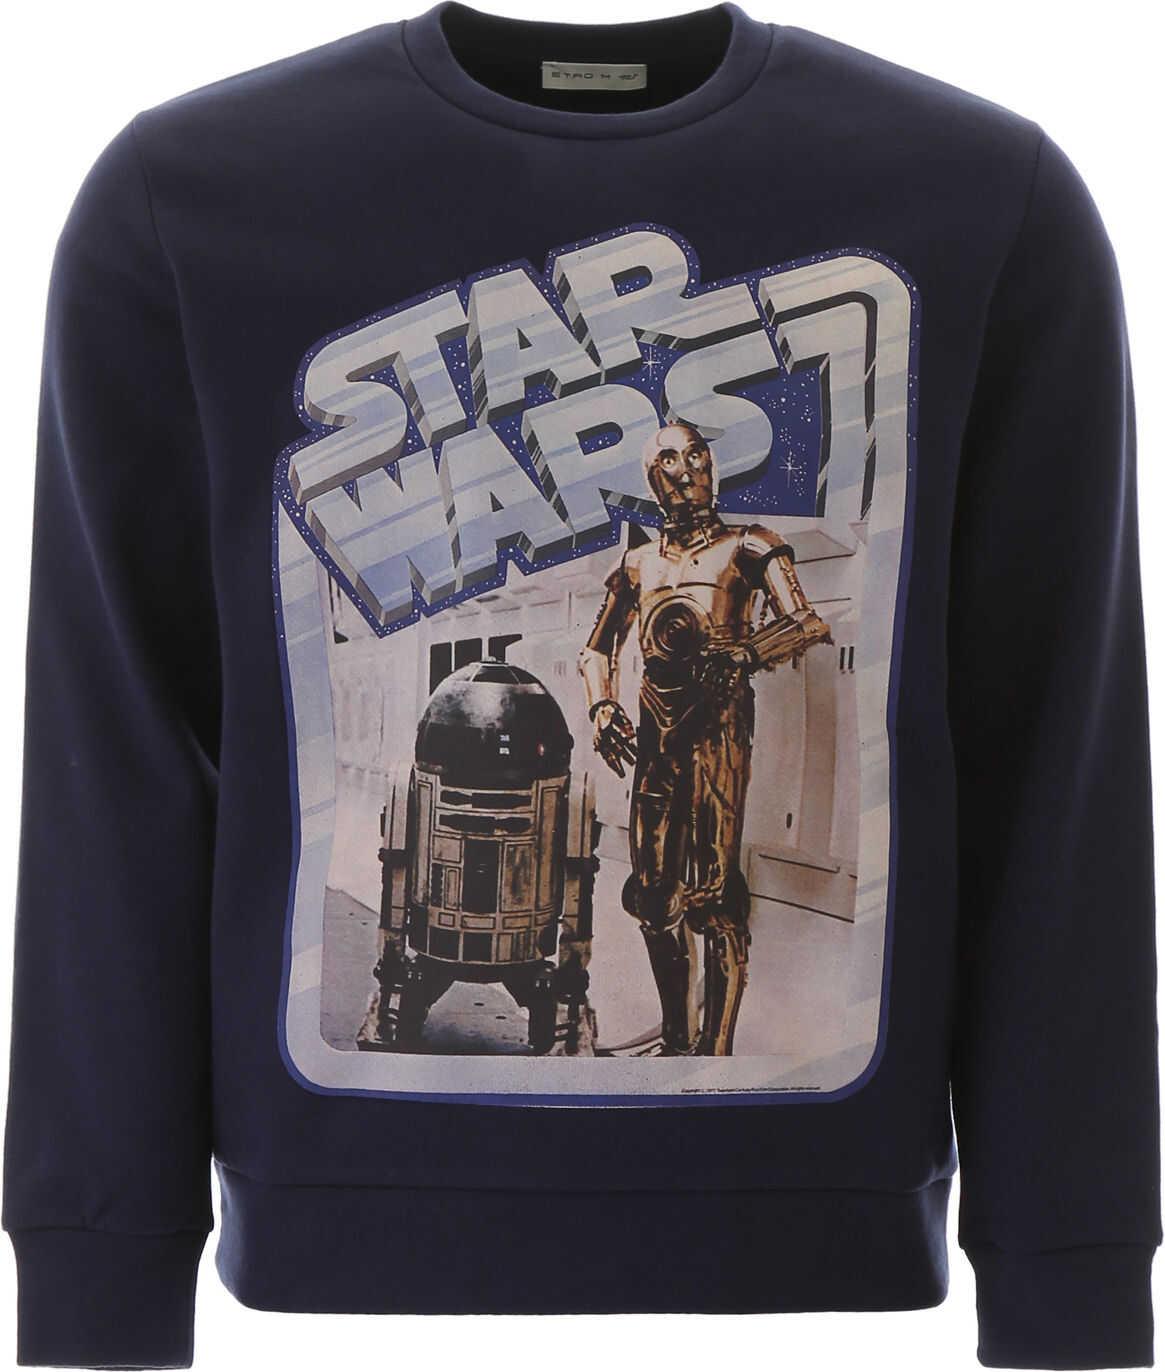 ETRO Star Wars Sweatshirt BLU imagine